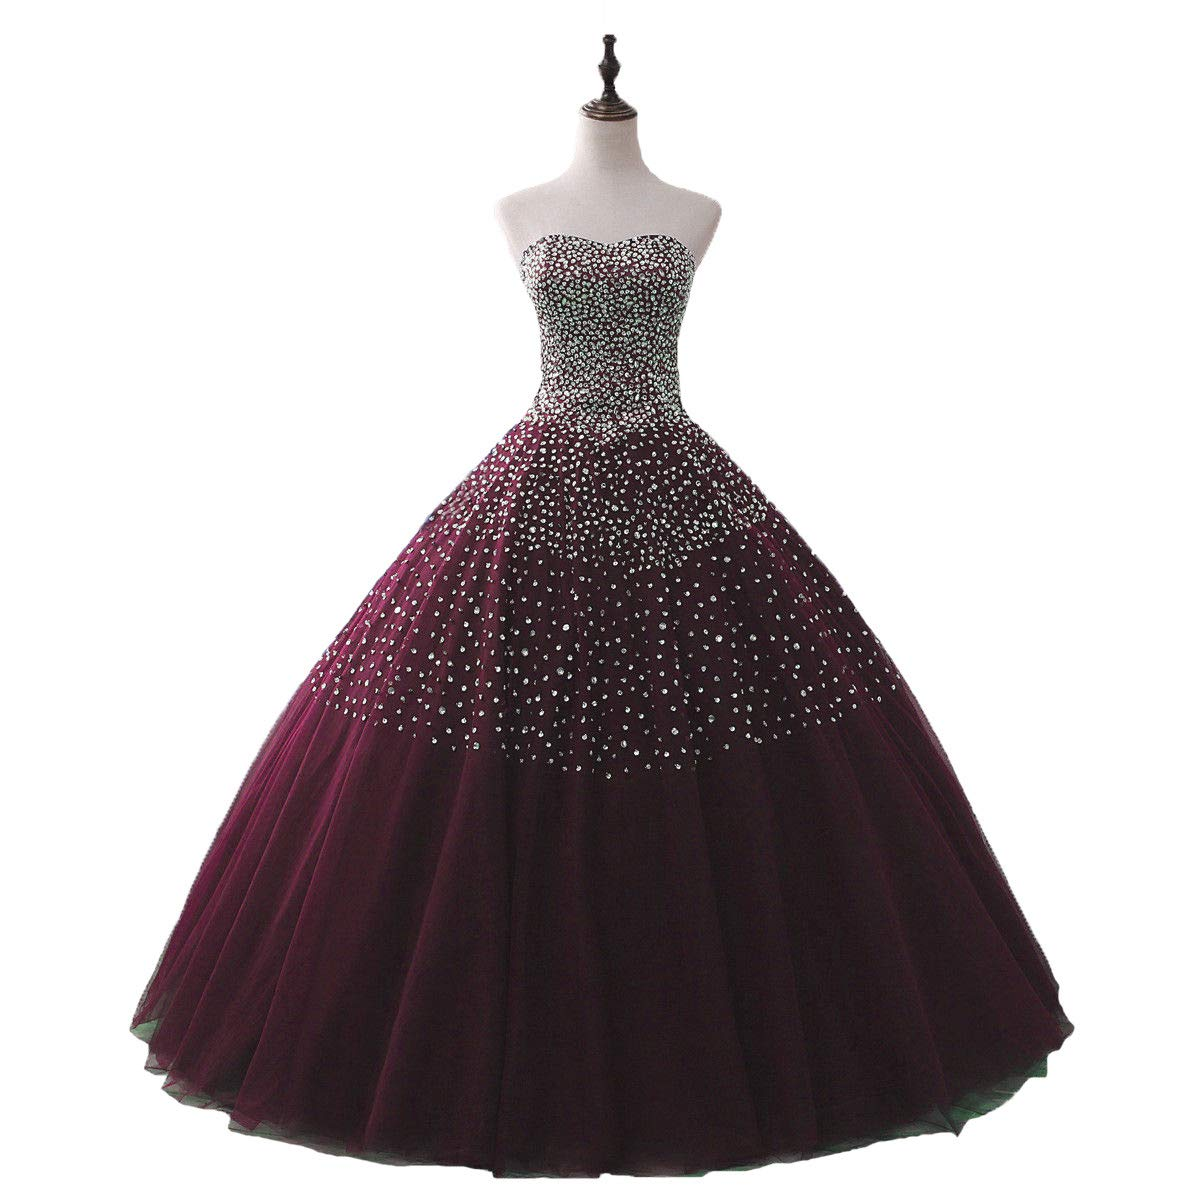 Burgundy Liaoye Women's Sweetheart Beaded Girls Quinceanera Dresses Tulle Prom Wedding Ball Gown